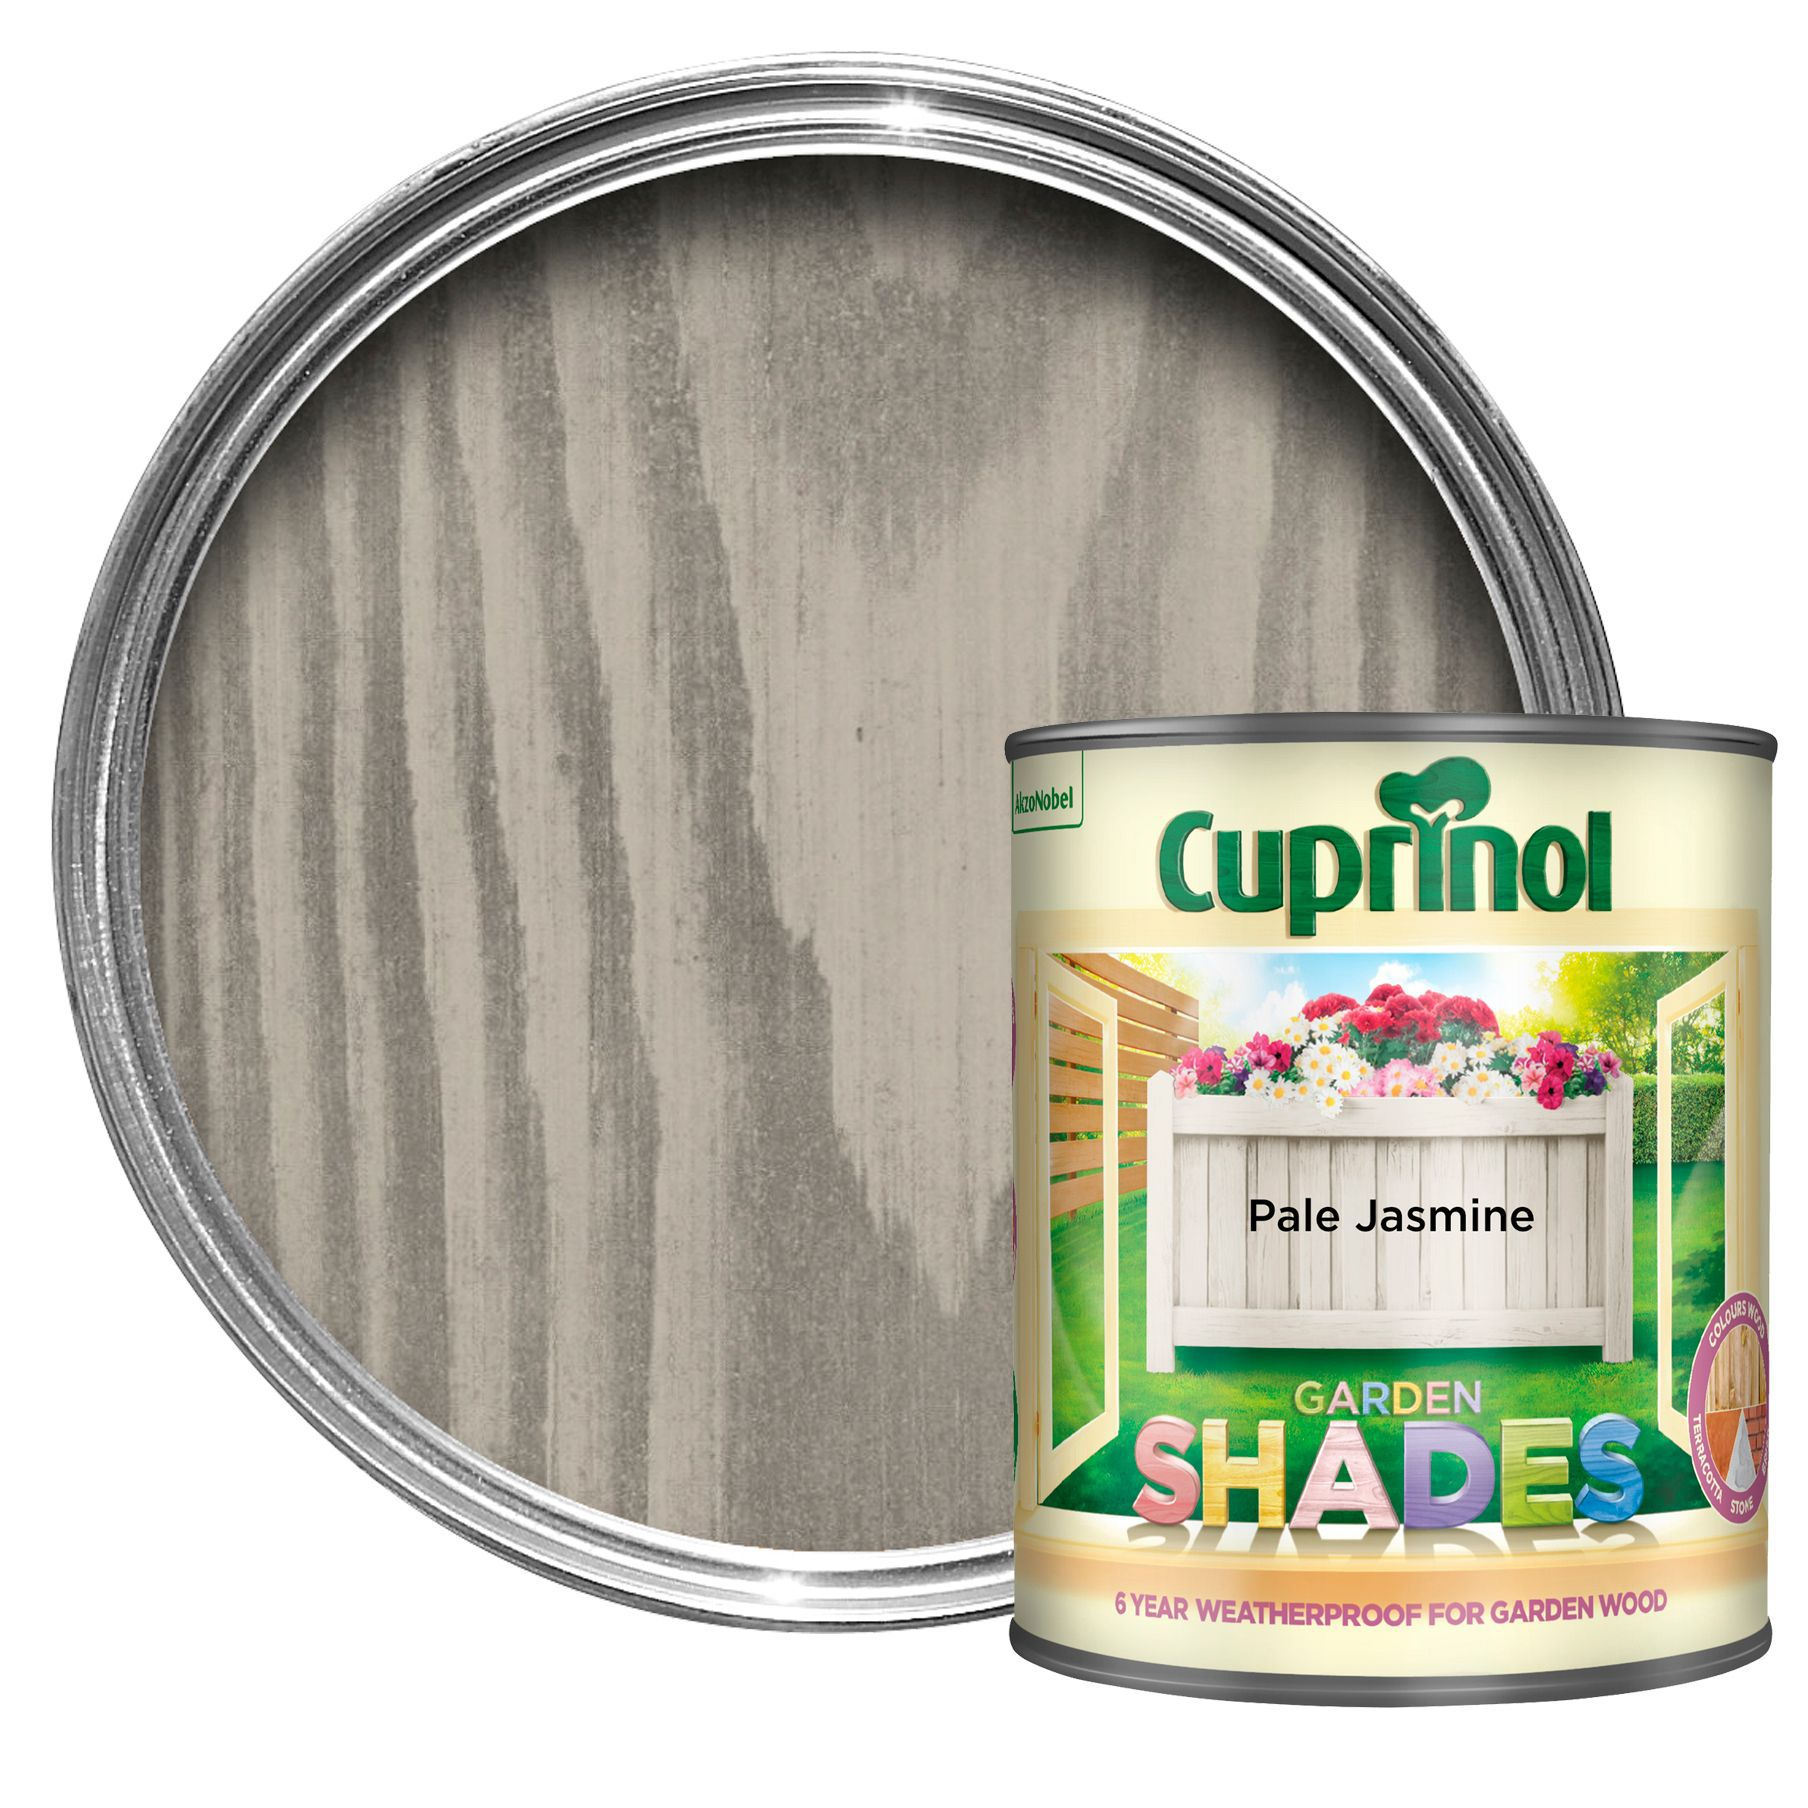 Cuprinol Garden Shades Pale Jasmine Matt Wood Paint 1l